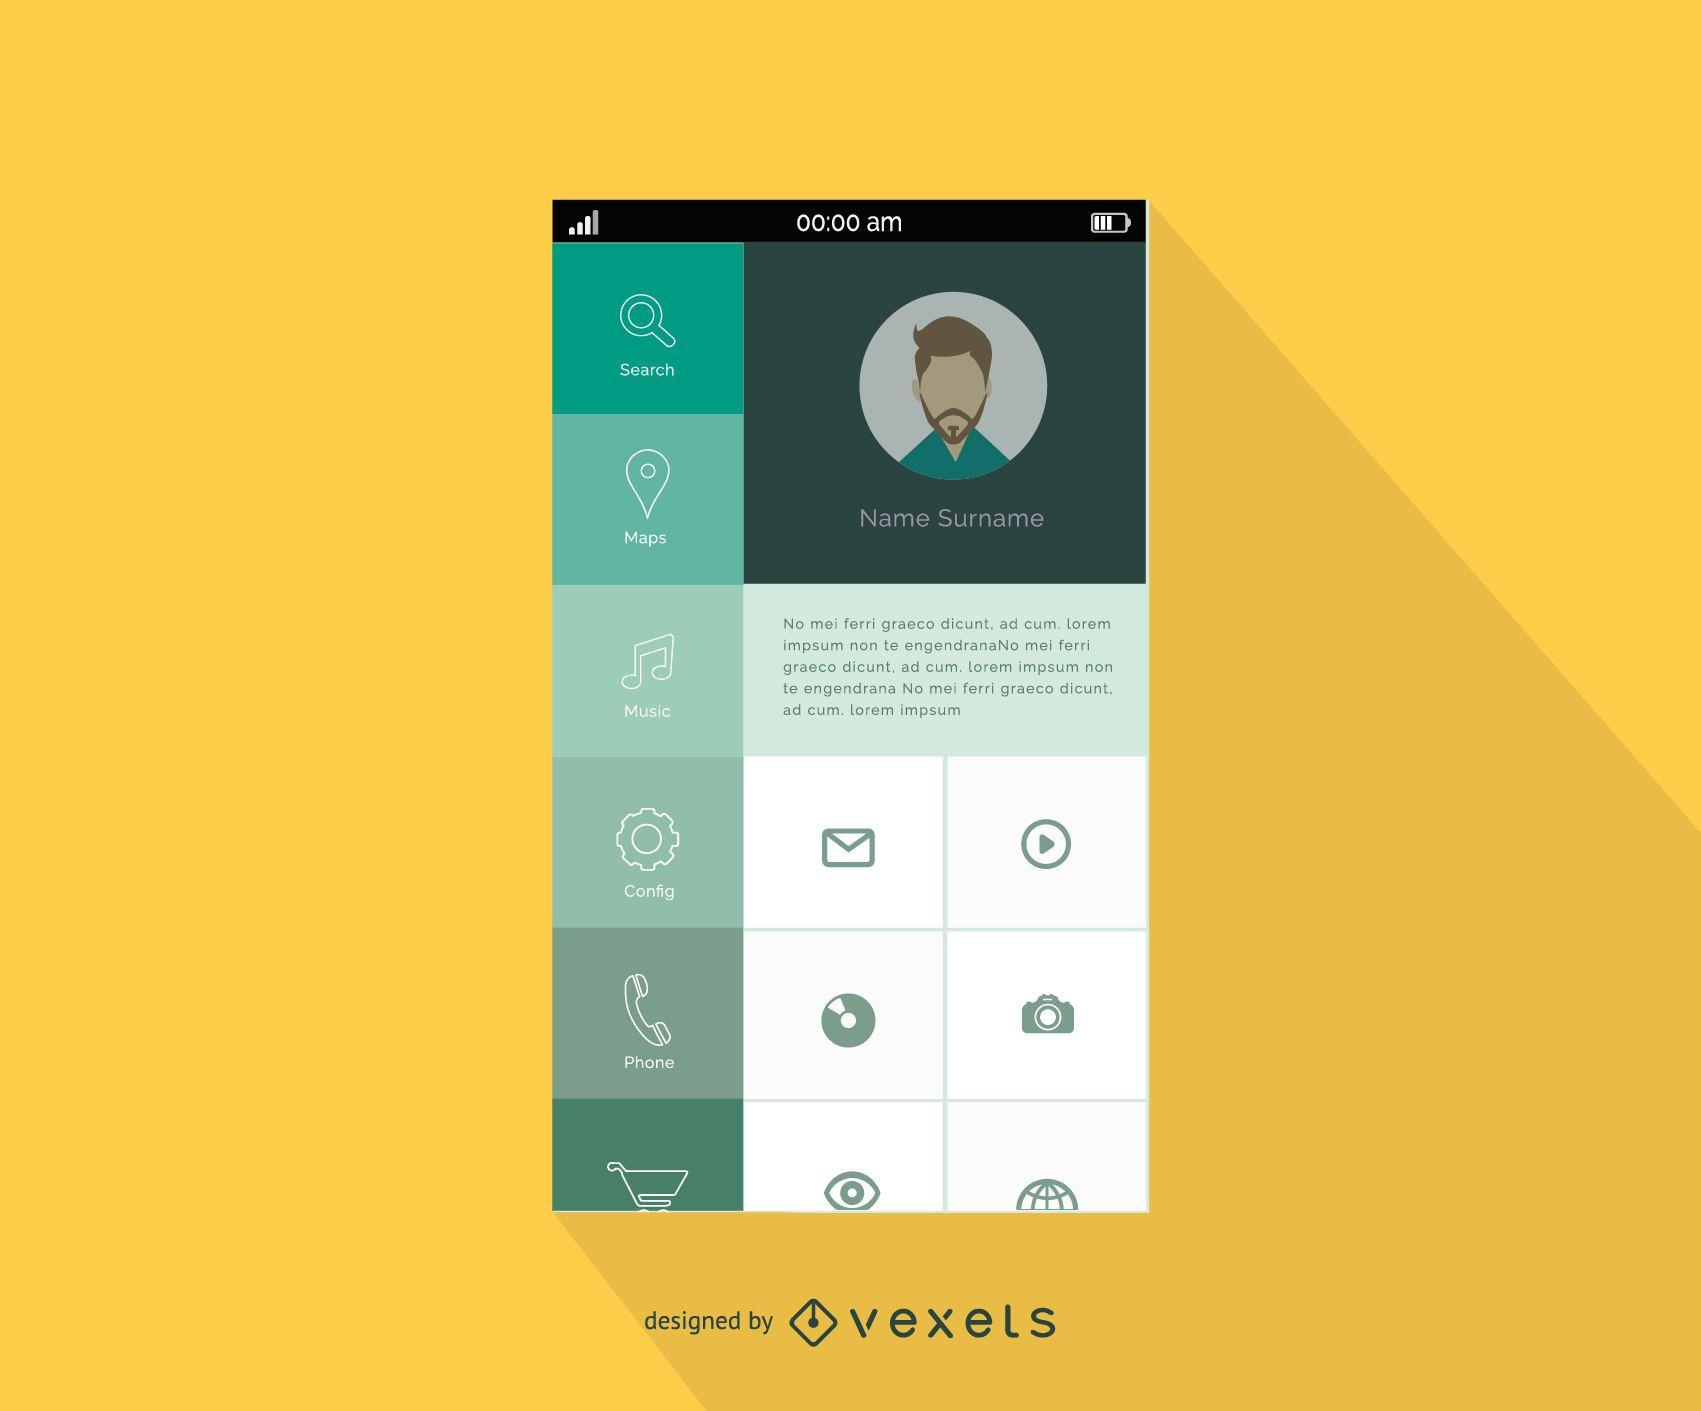 Diseño de menú de interfaz de teléfono inteligente